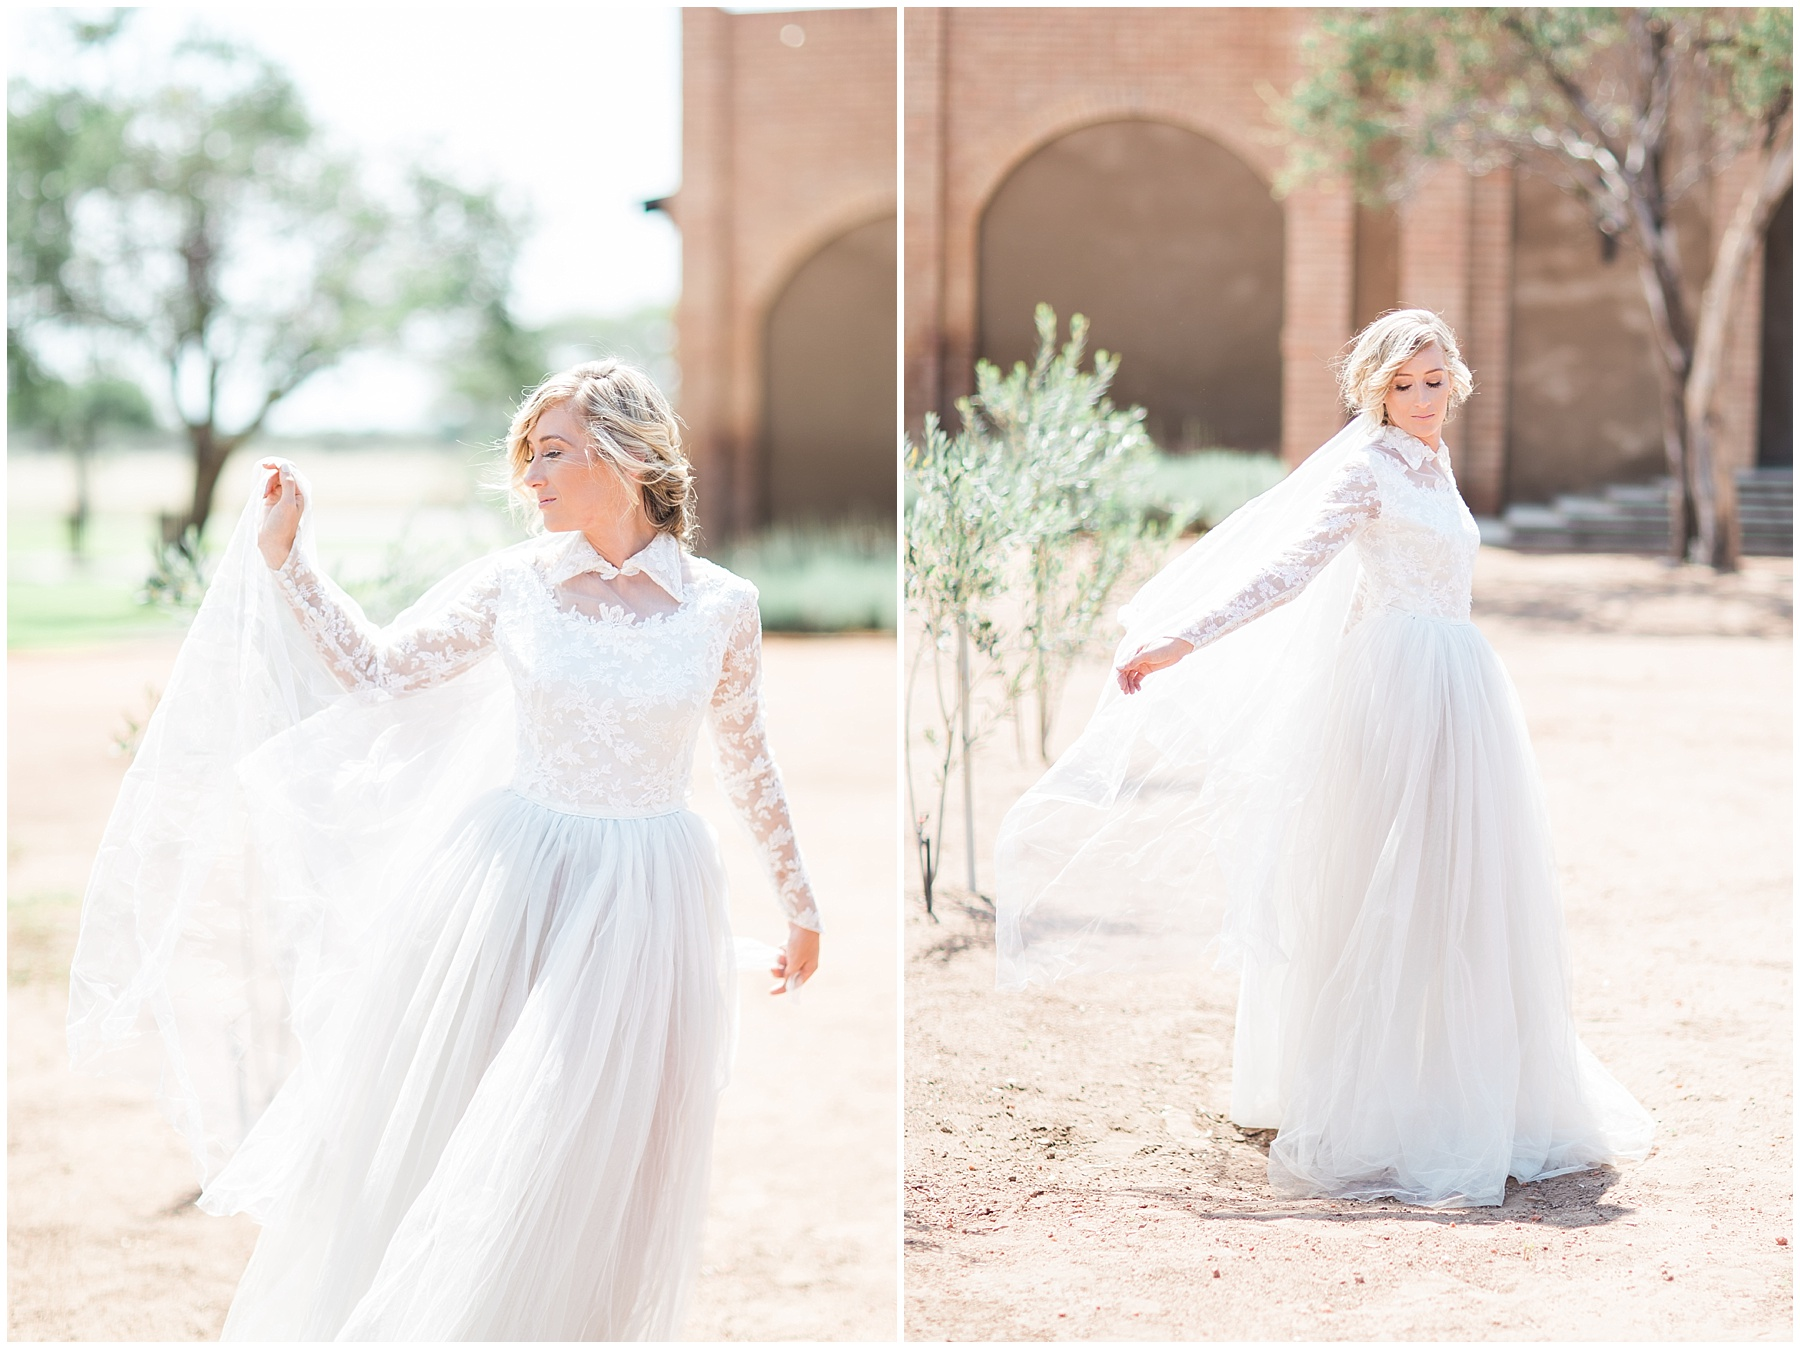 AliciaLandman_JoleneandZander_Wedding_The Pretty Blog_0430.jpg